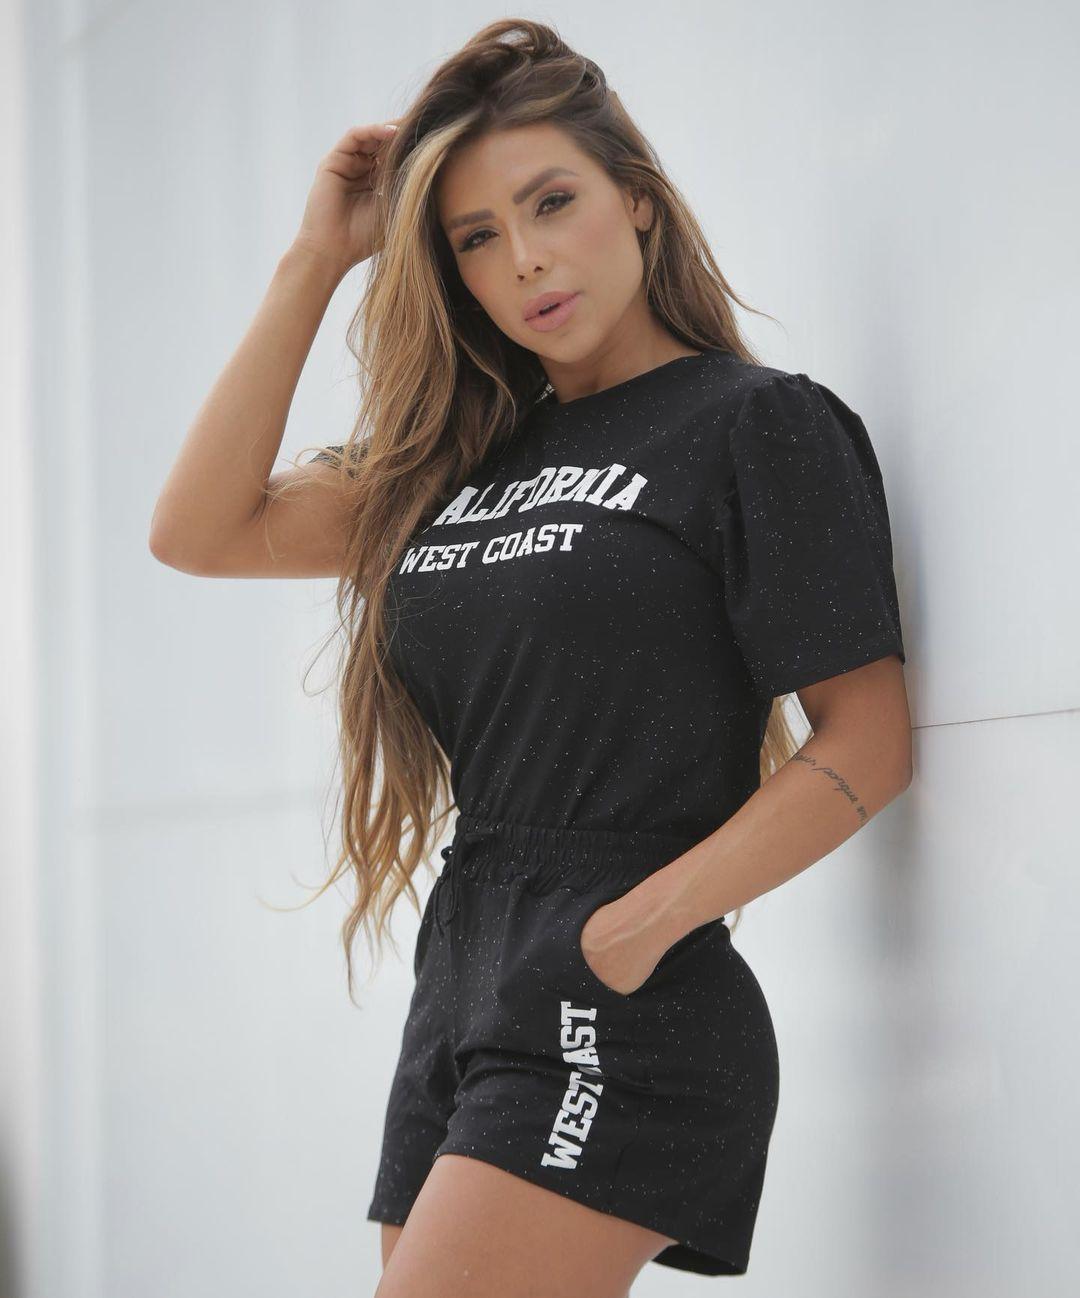 Alessandra-Batista-Wallpapers-Insta-FIt-Bio-4